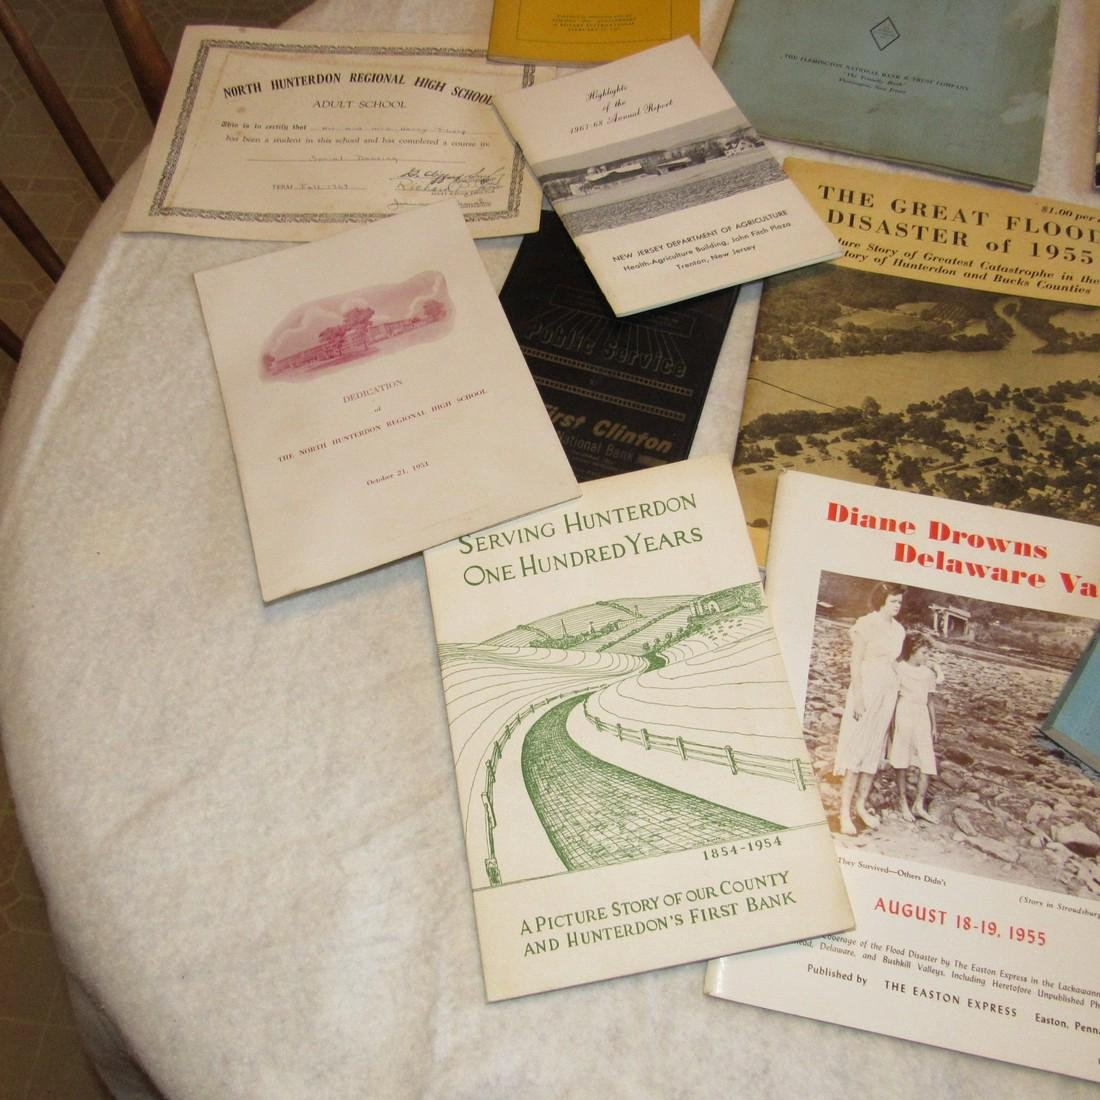 Local Books Catalogs Programs Certificate Lot - 5